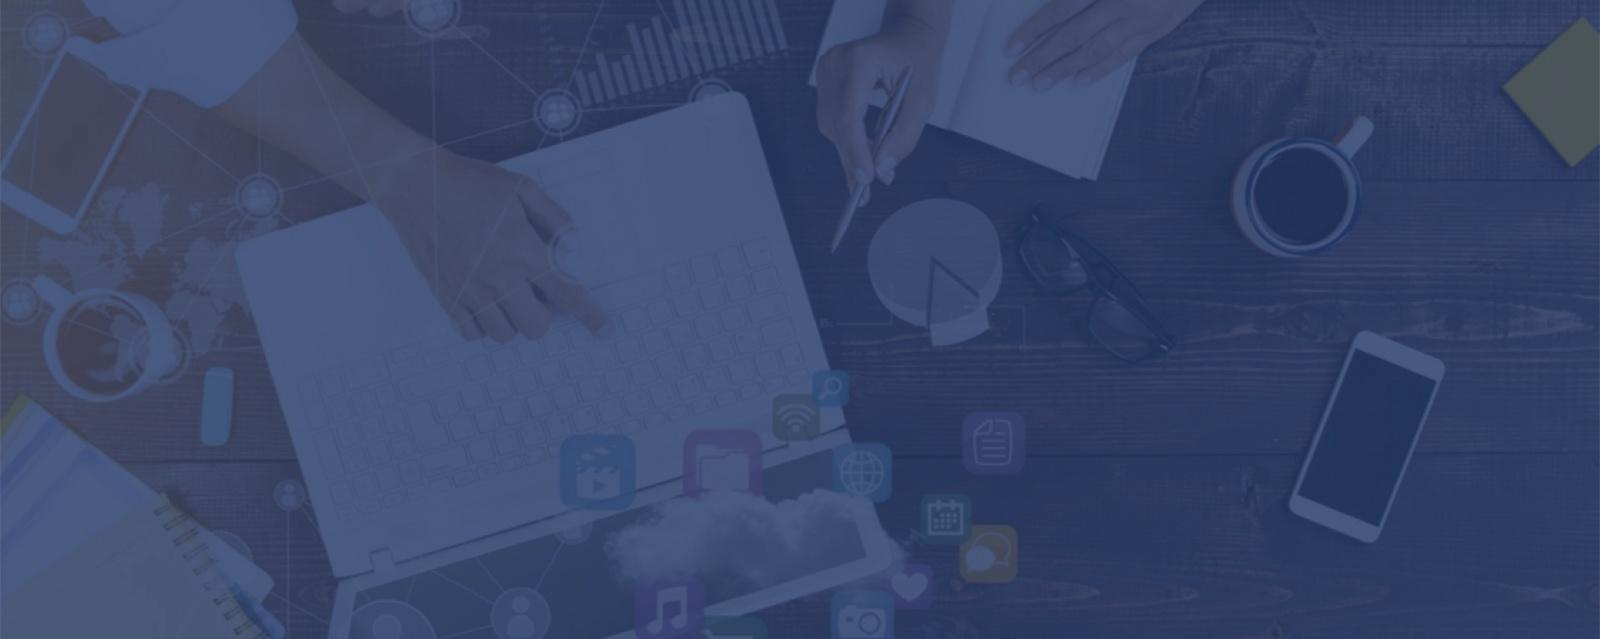 Blueprint for Digital Learning Transformation